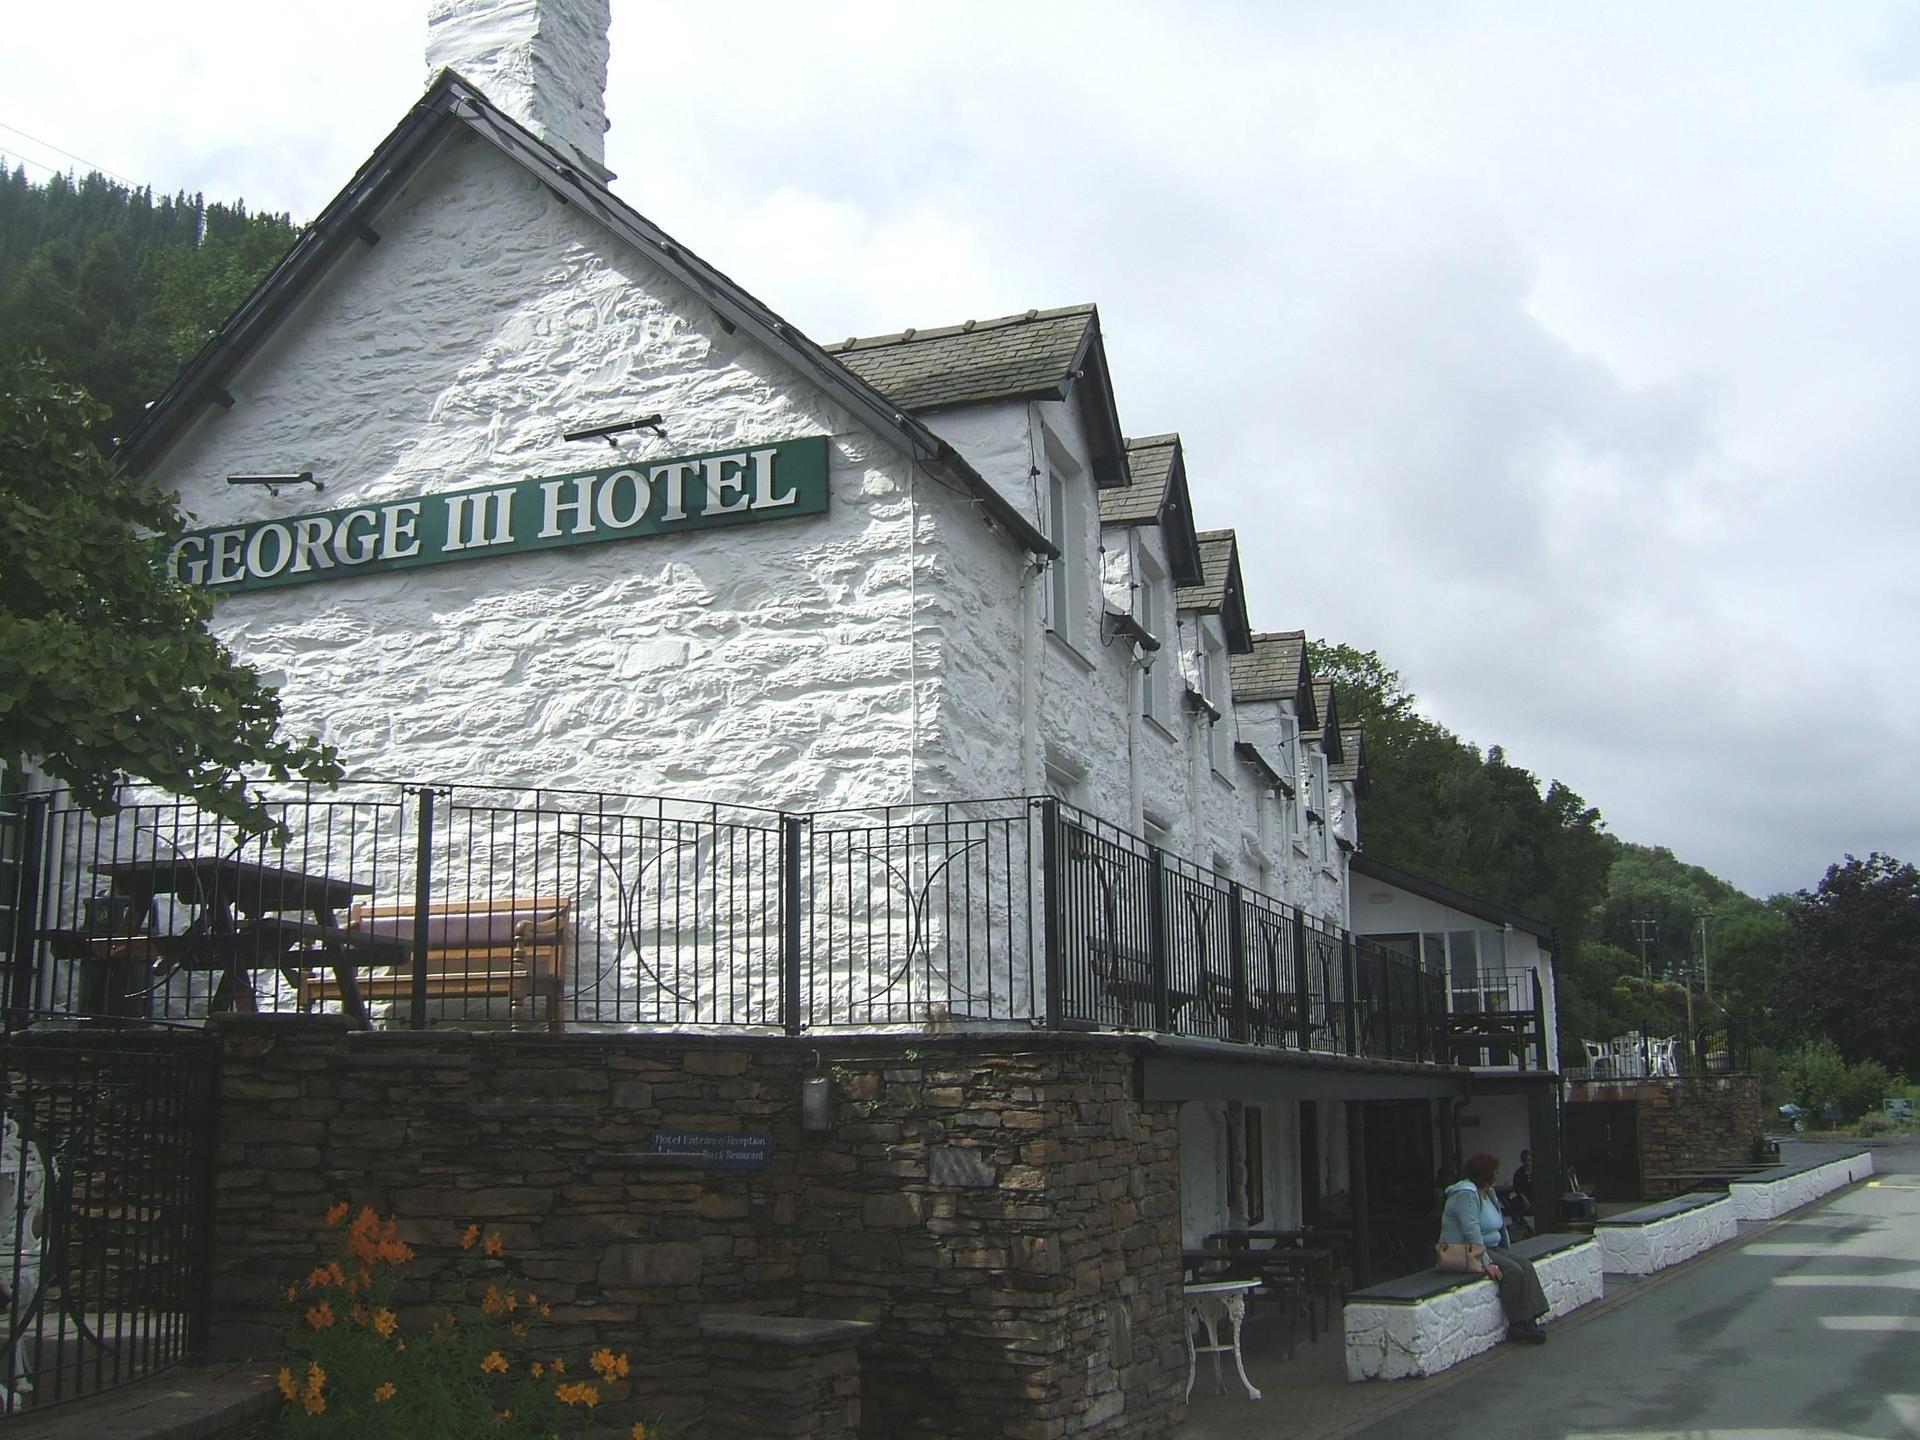 George III Hotel